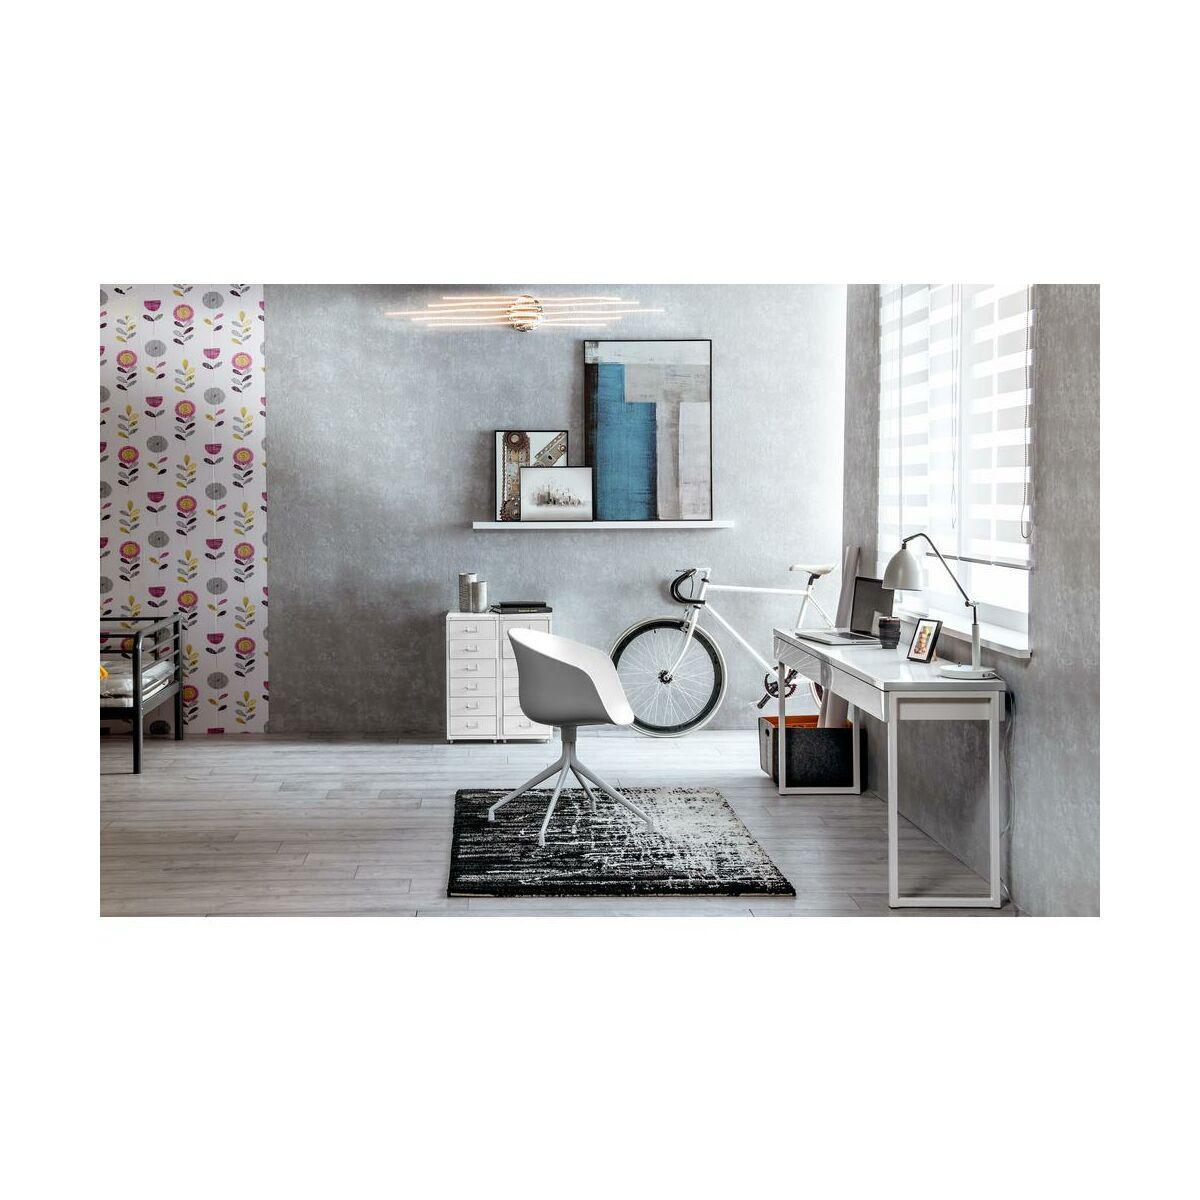 tapeta beton winylowa na flizelinie tapety dekoracyjne. Black Bedroom Furniture Sets. Home Design Ideas